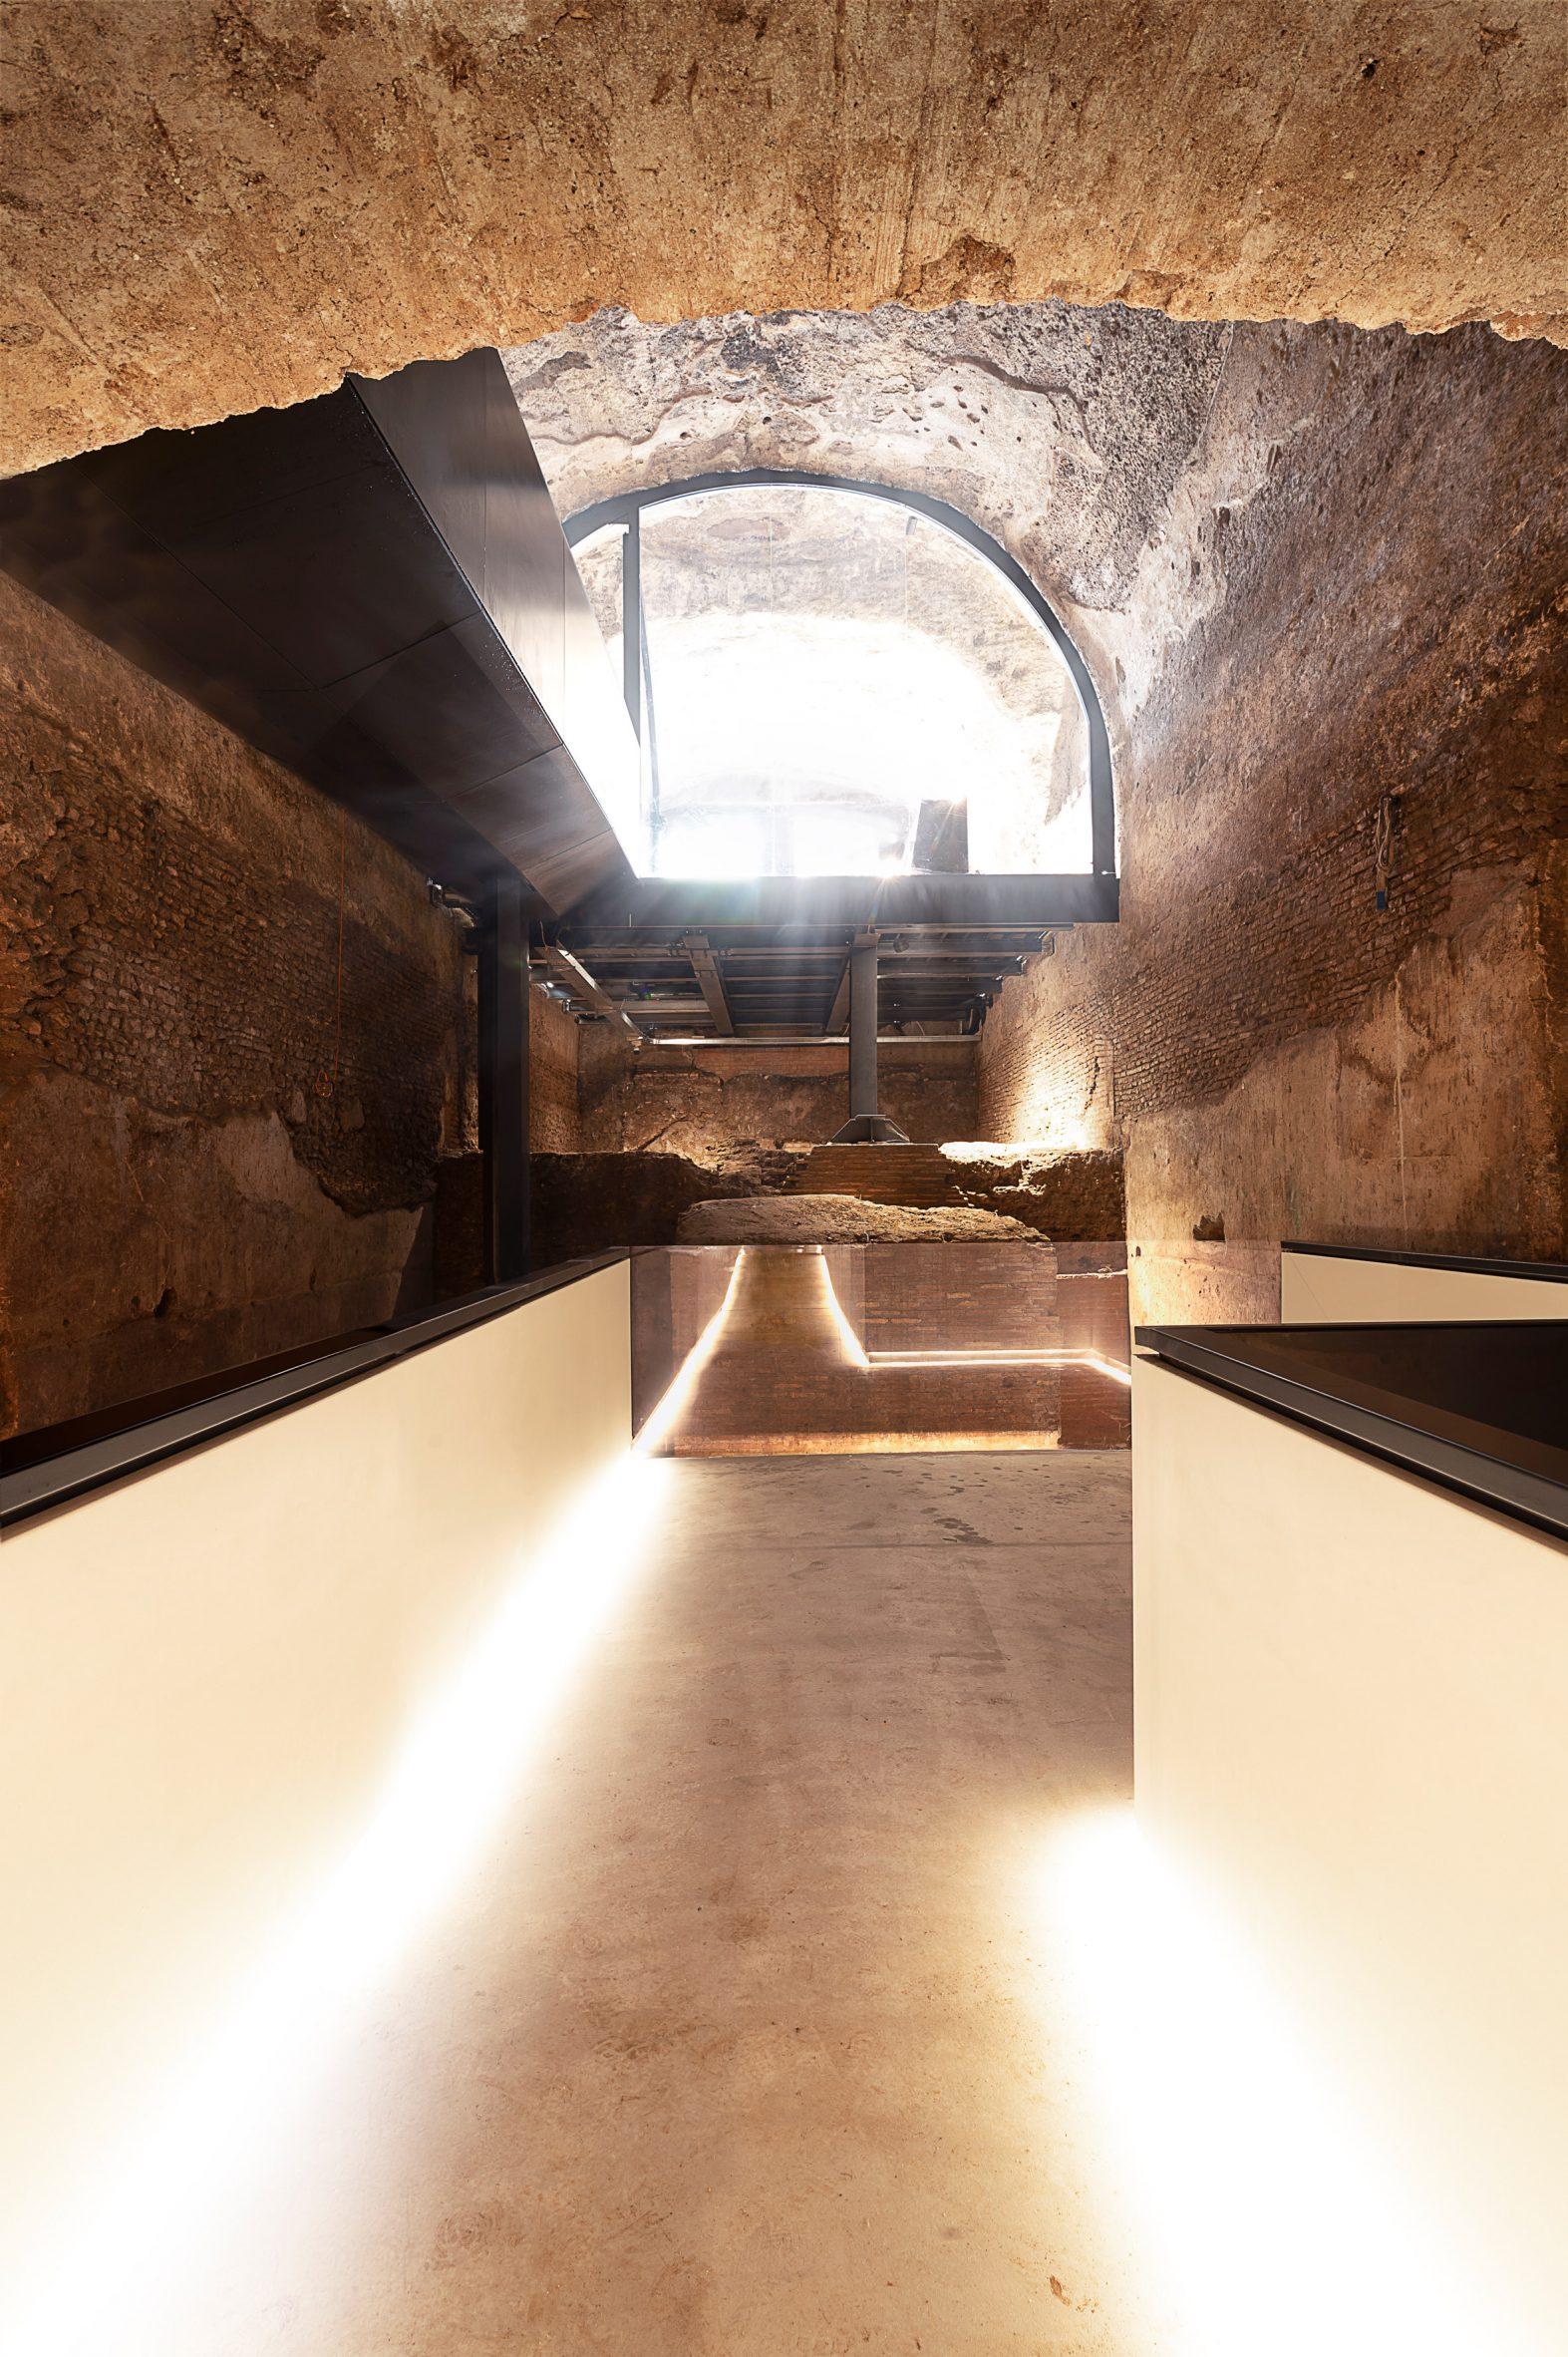 An entrance and walkway inside Domus Aurea